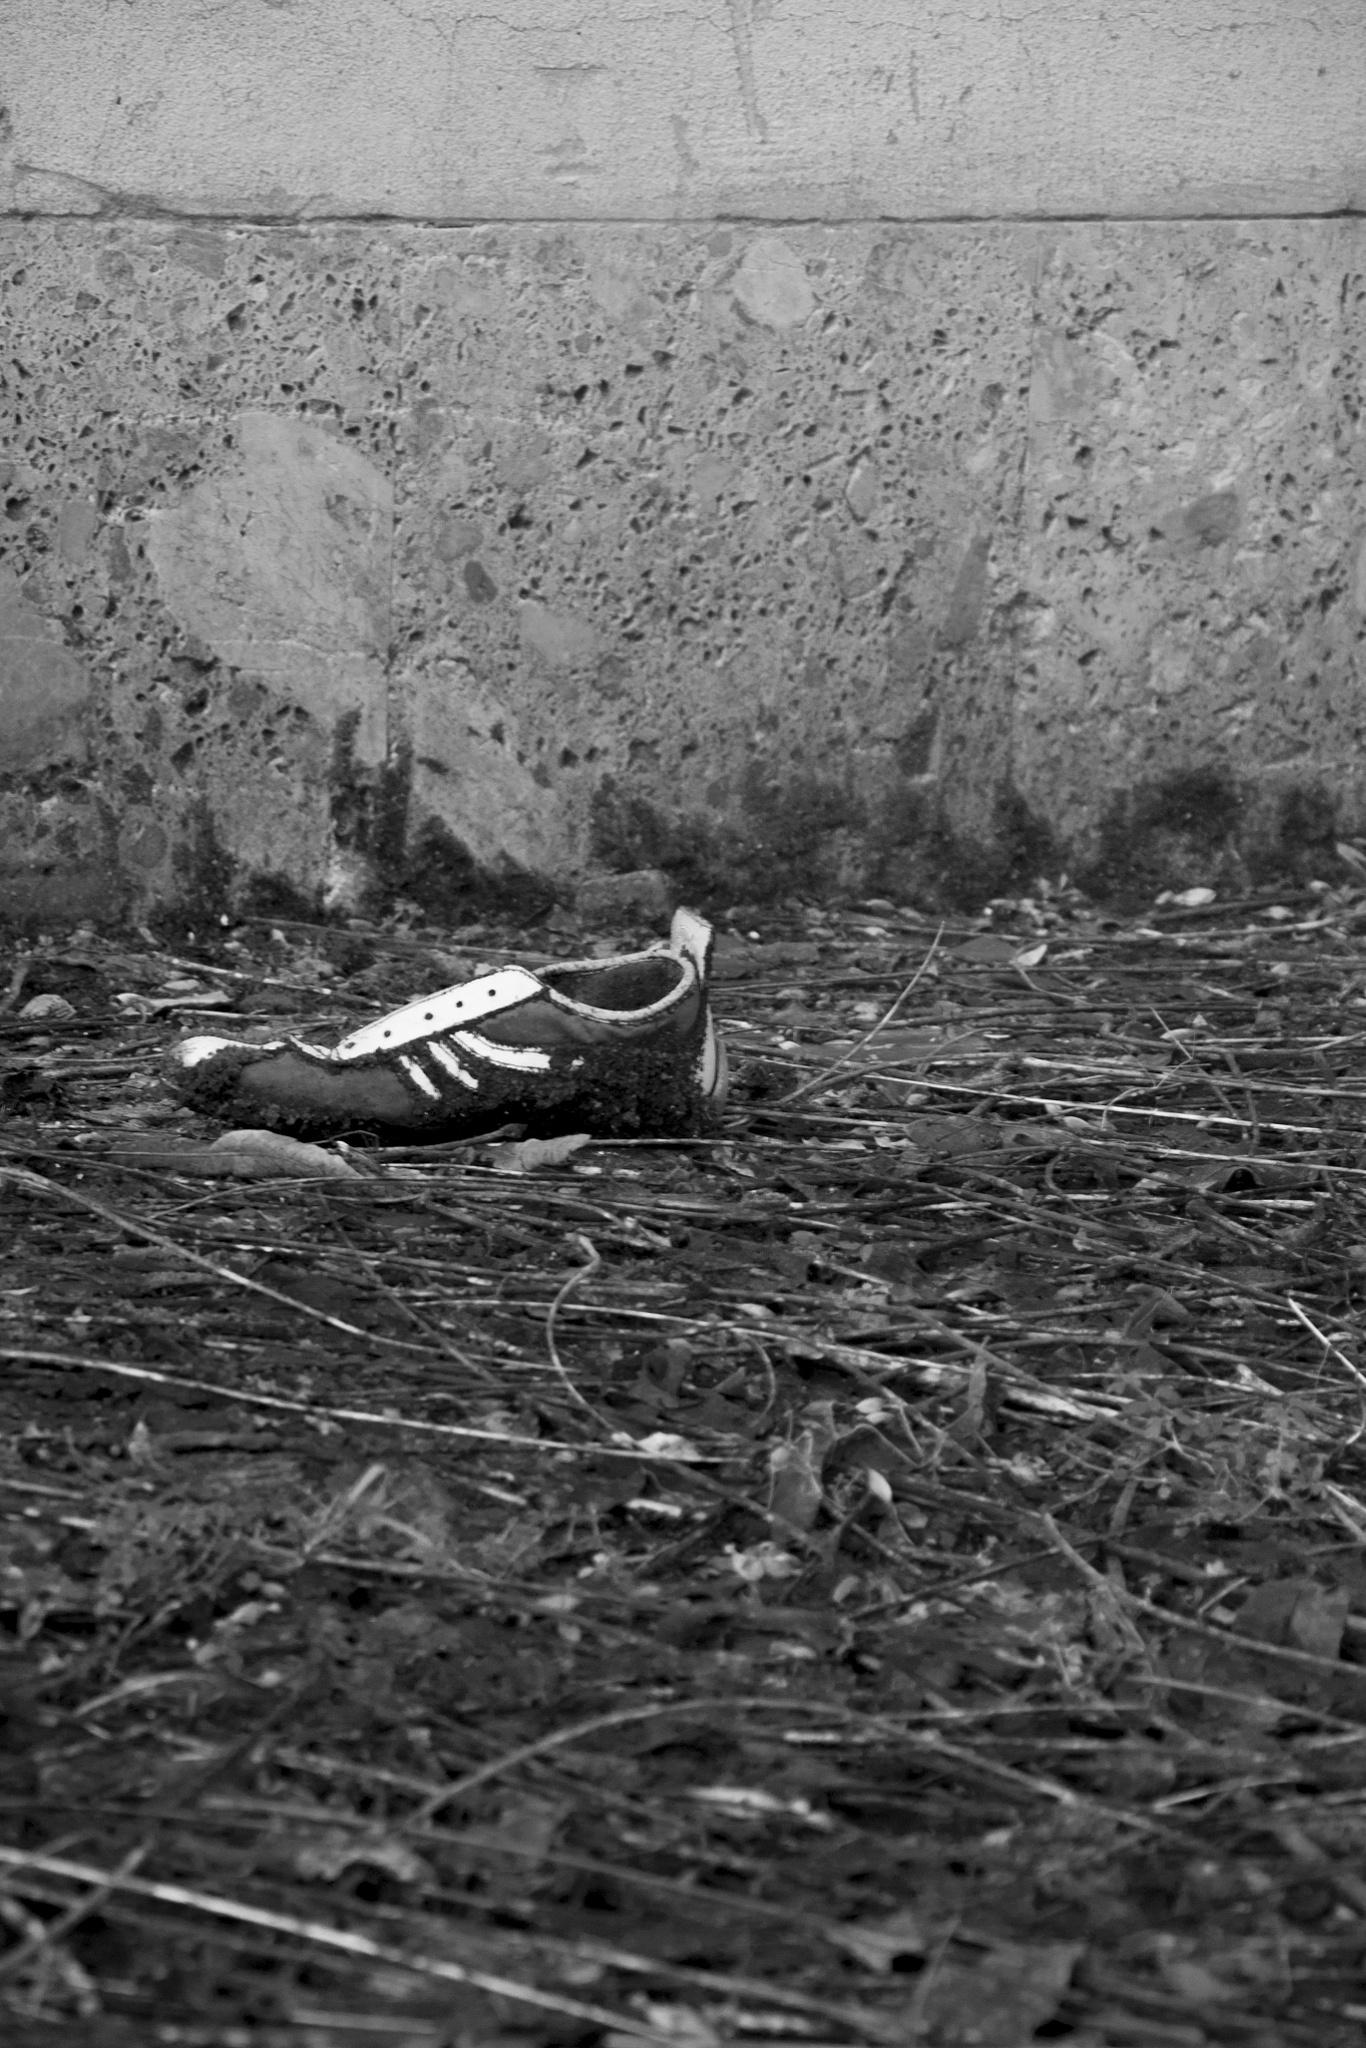 Lost shoe by gabriele.zucchella